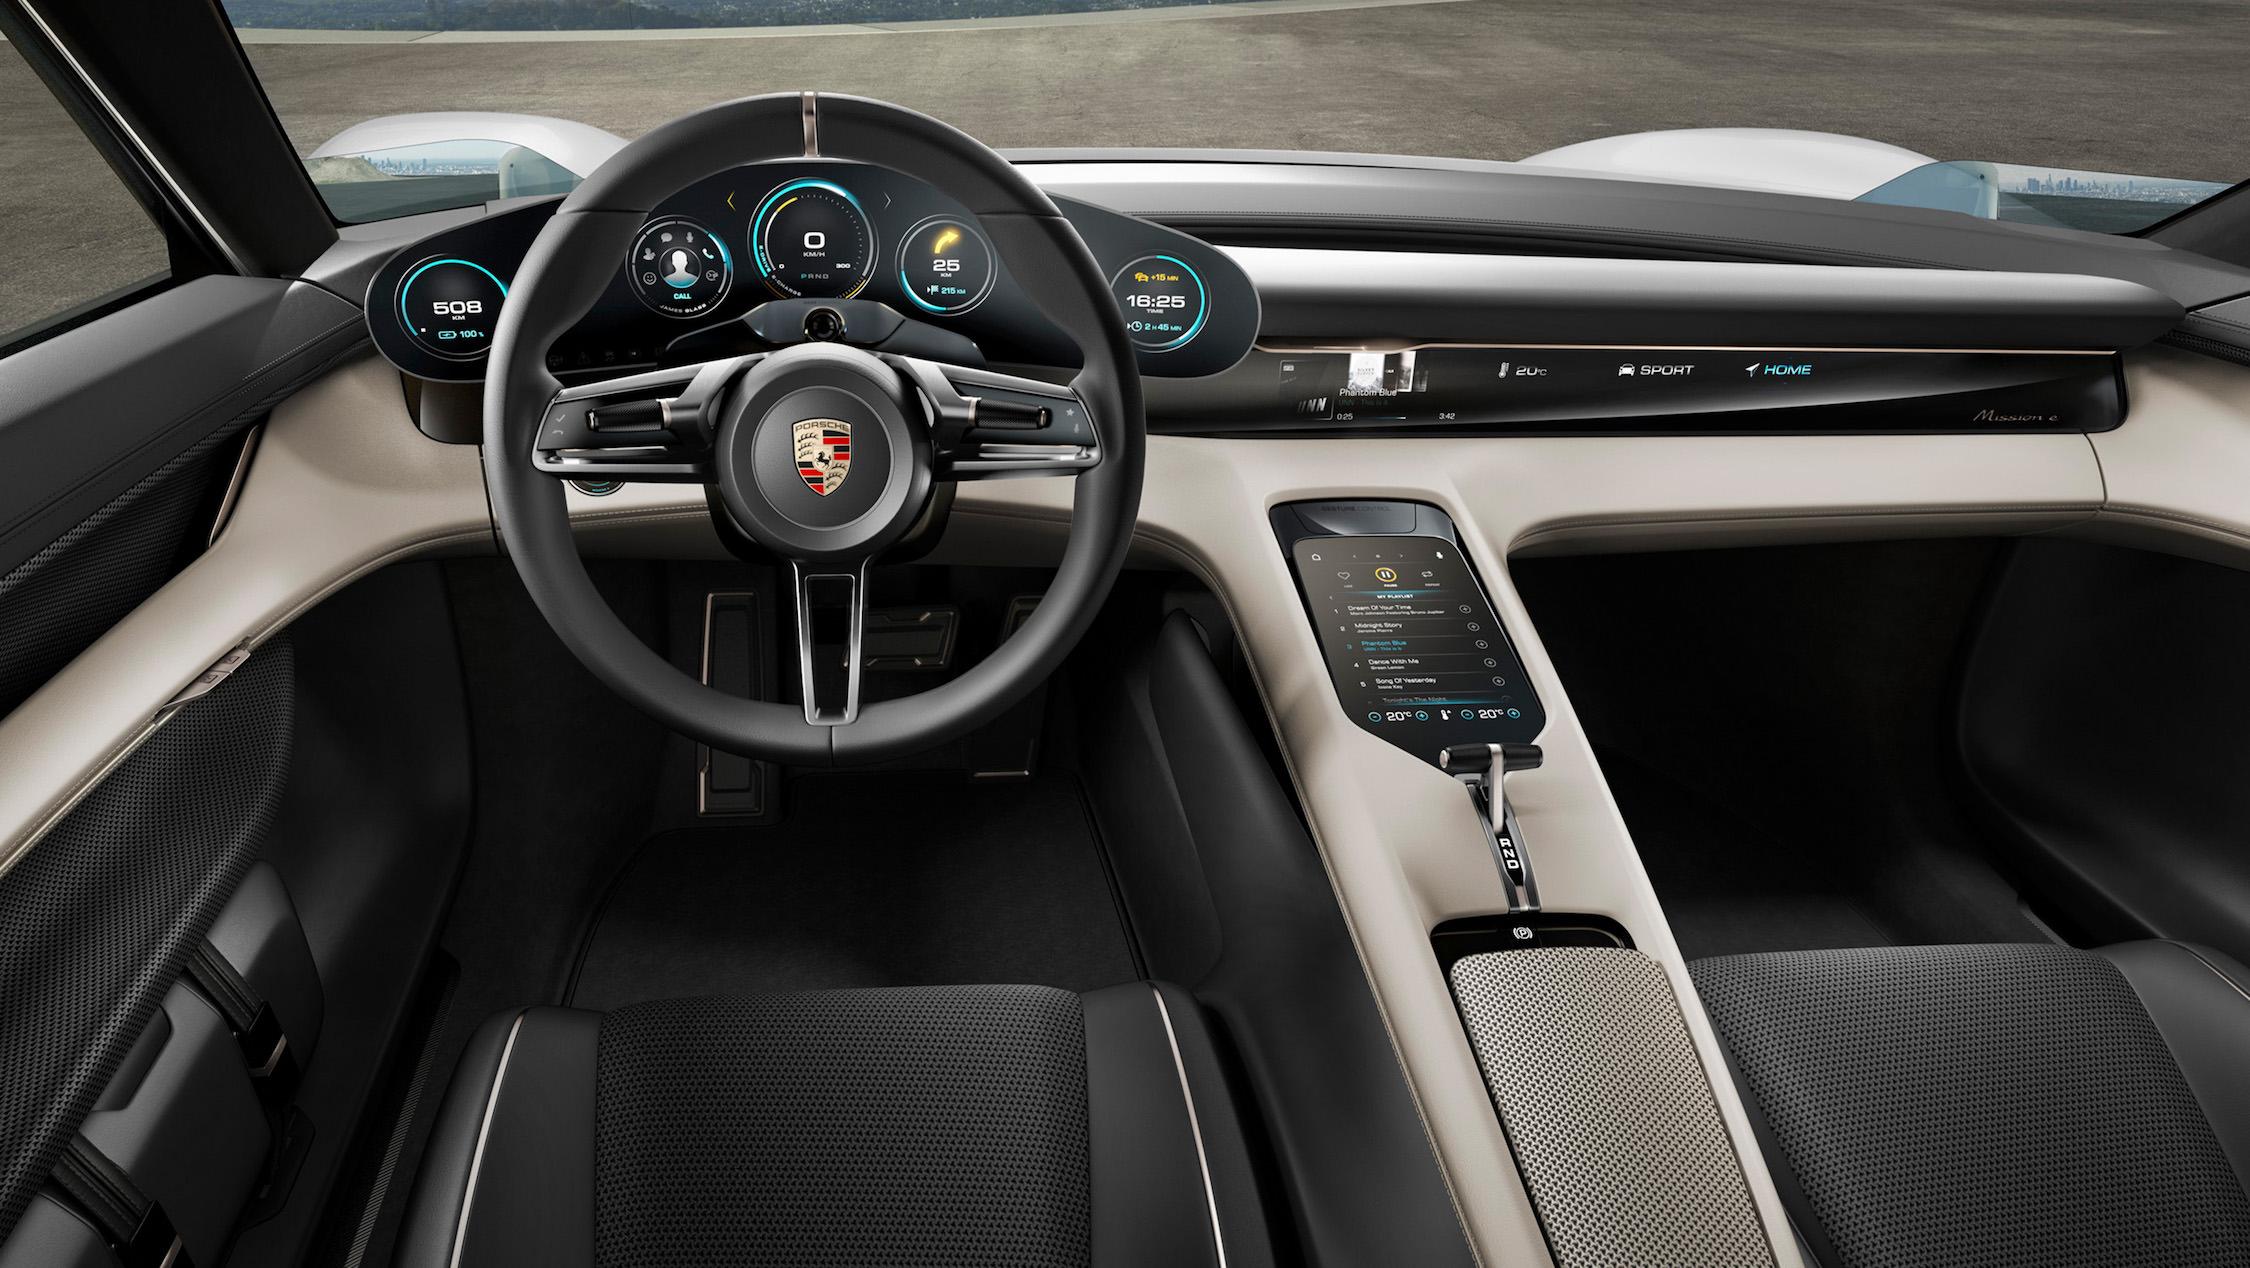 high_mission_e_concept_car_2015_porsche_ag-5